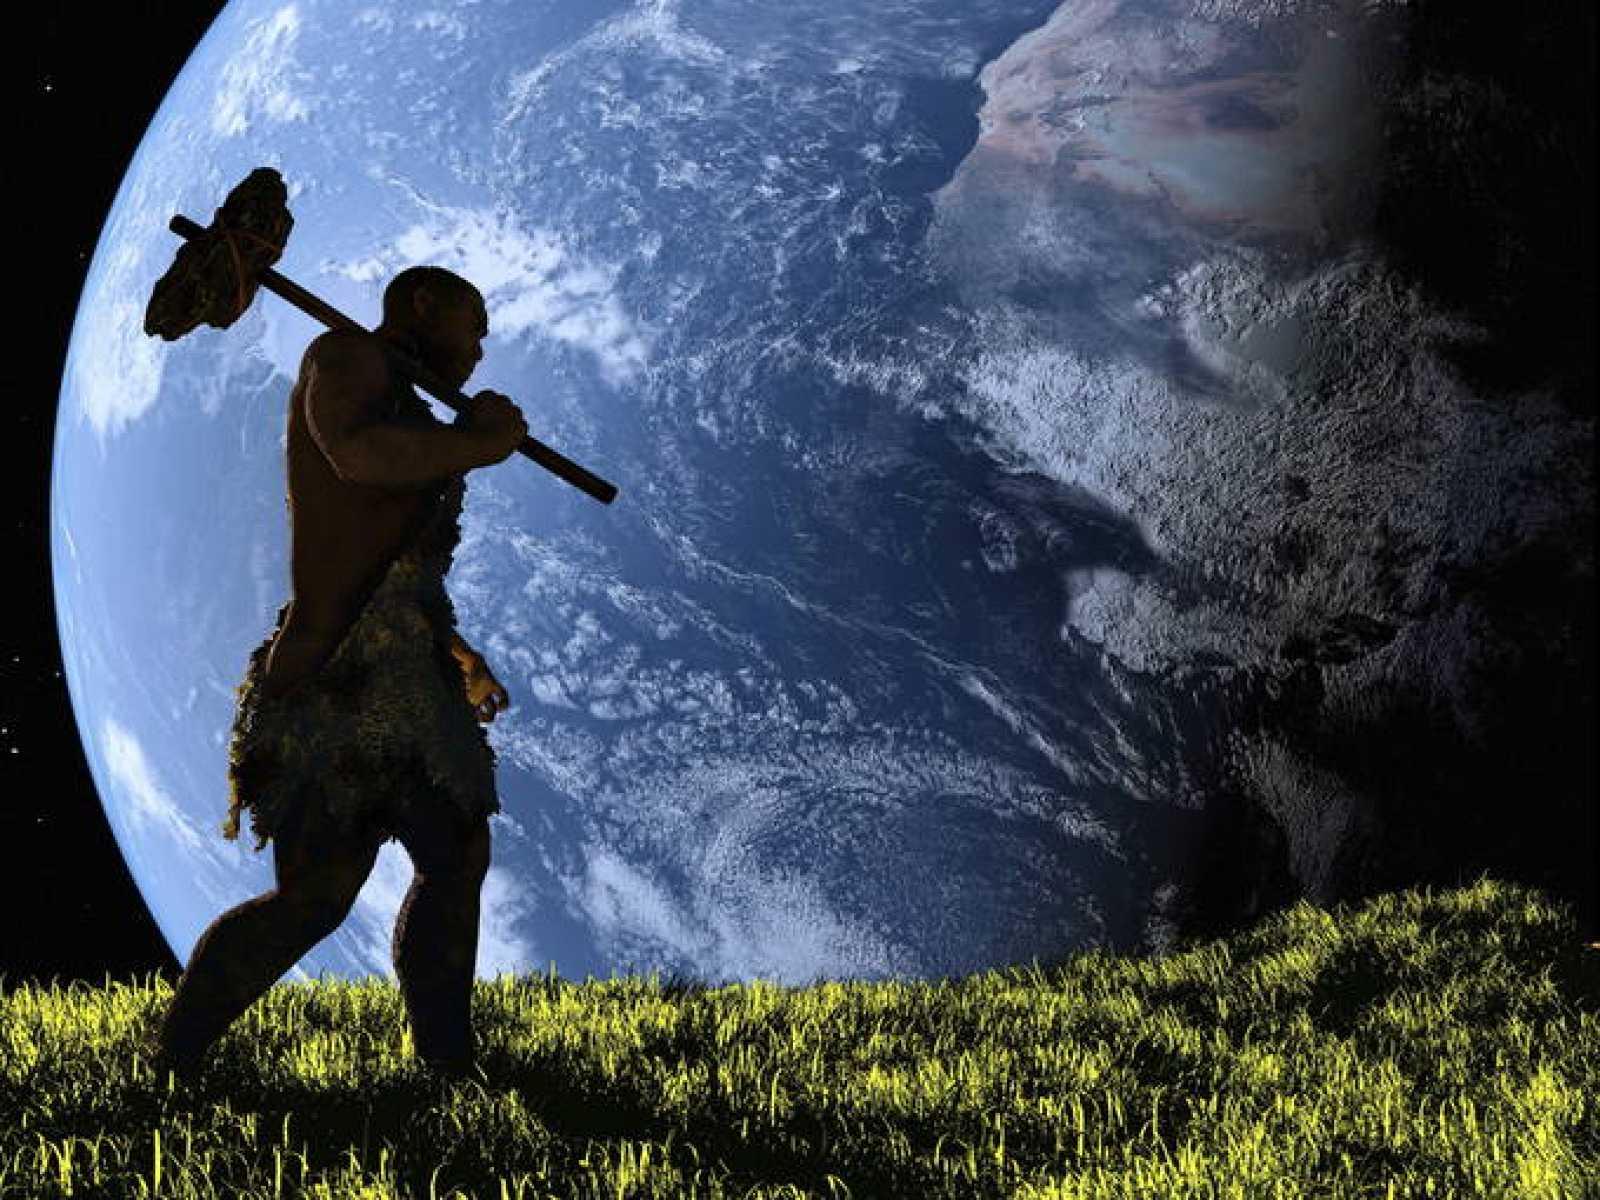 Recreación gráfica de un hombre primitivo